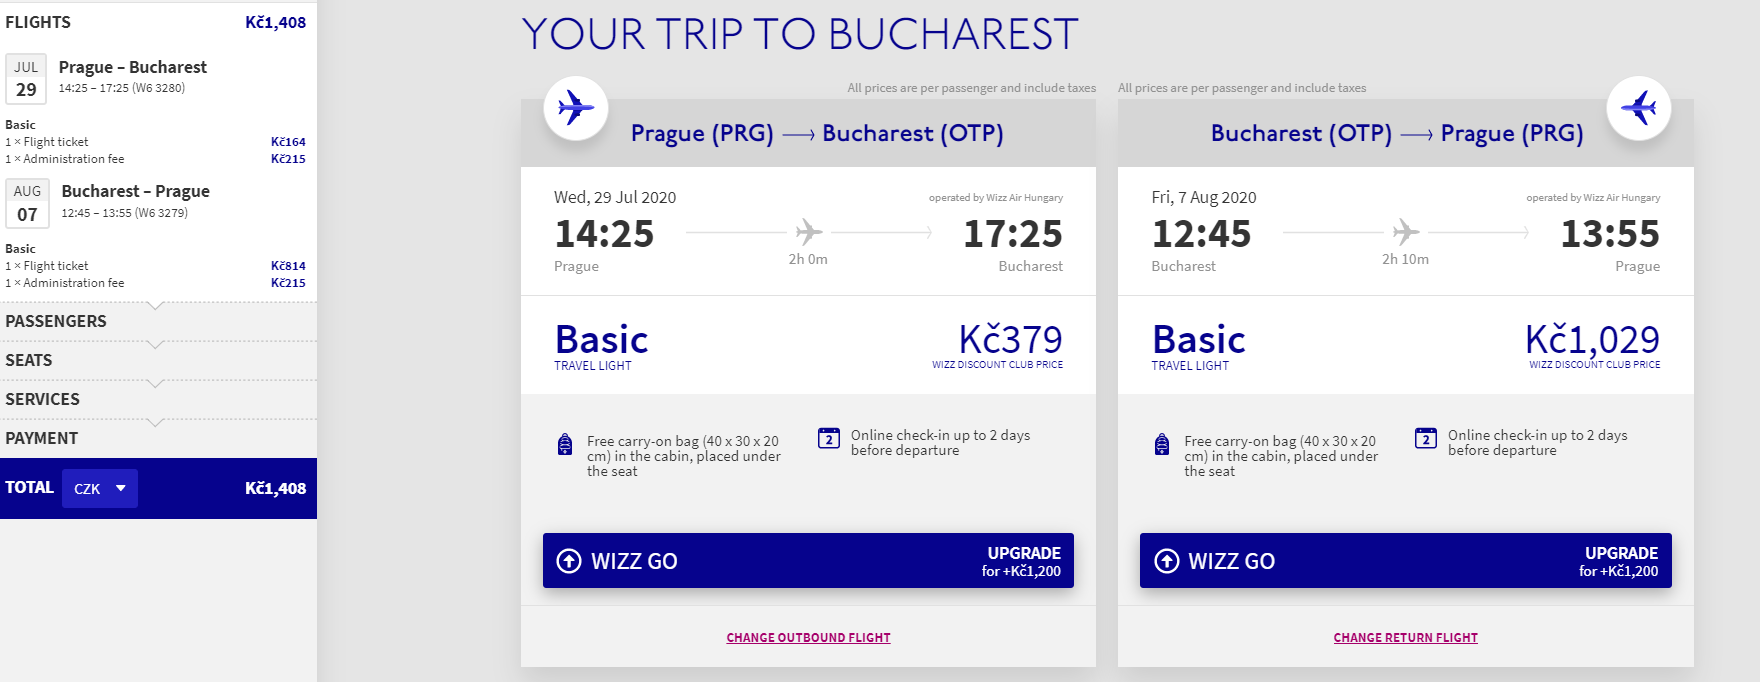 Bukurešť nově z Prahy - 1408 Kč